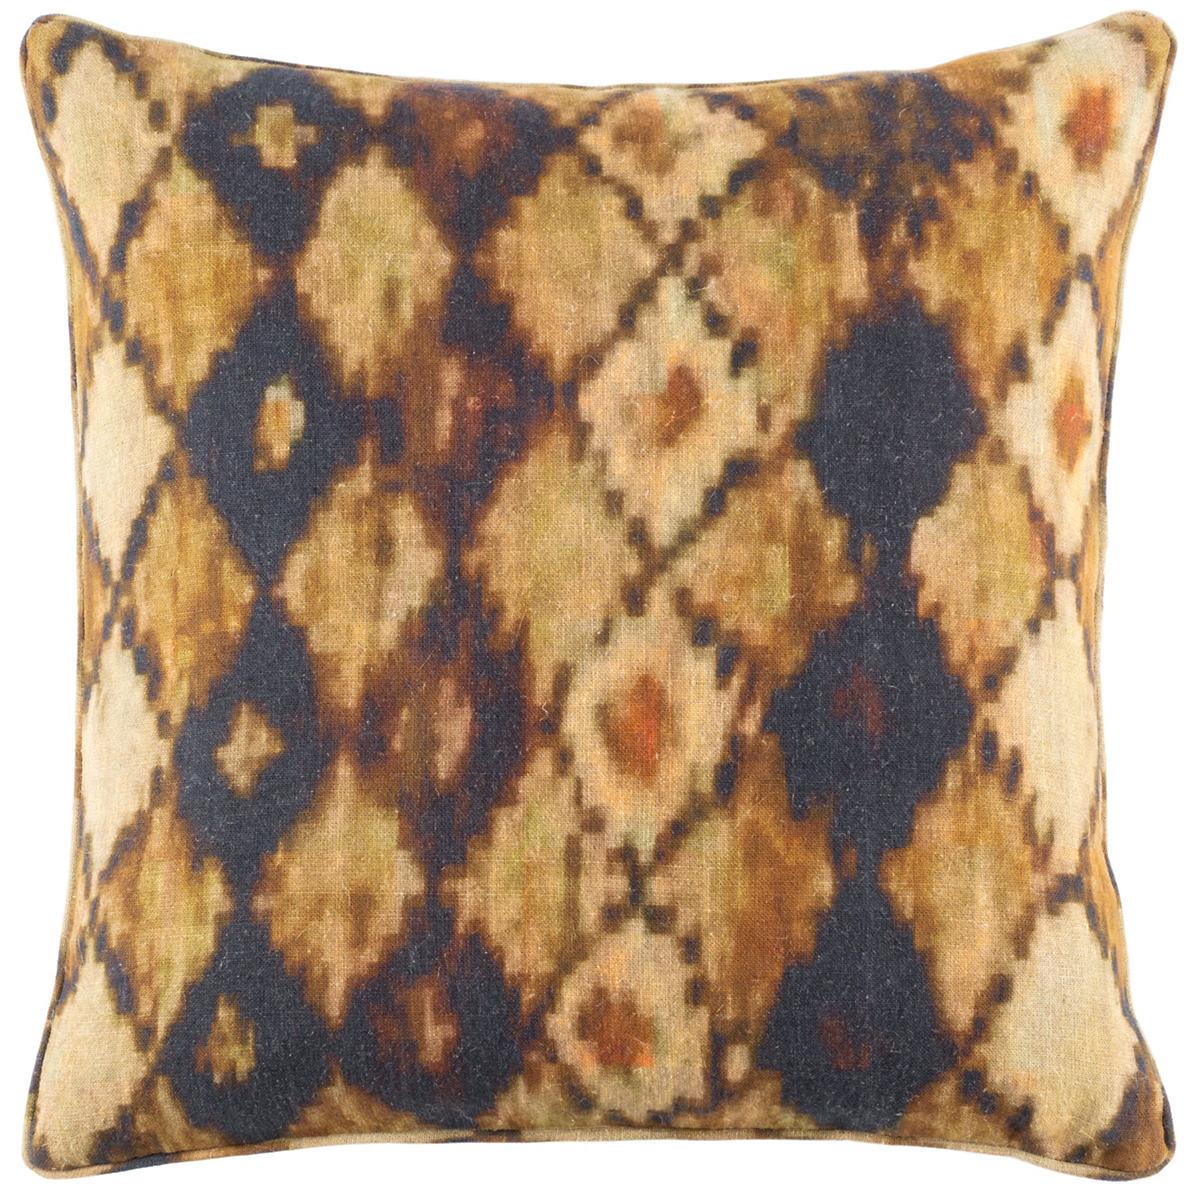 Emali Linen Decorative Pillow